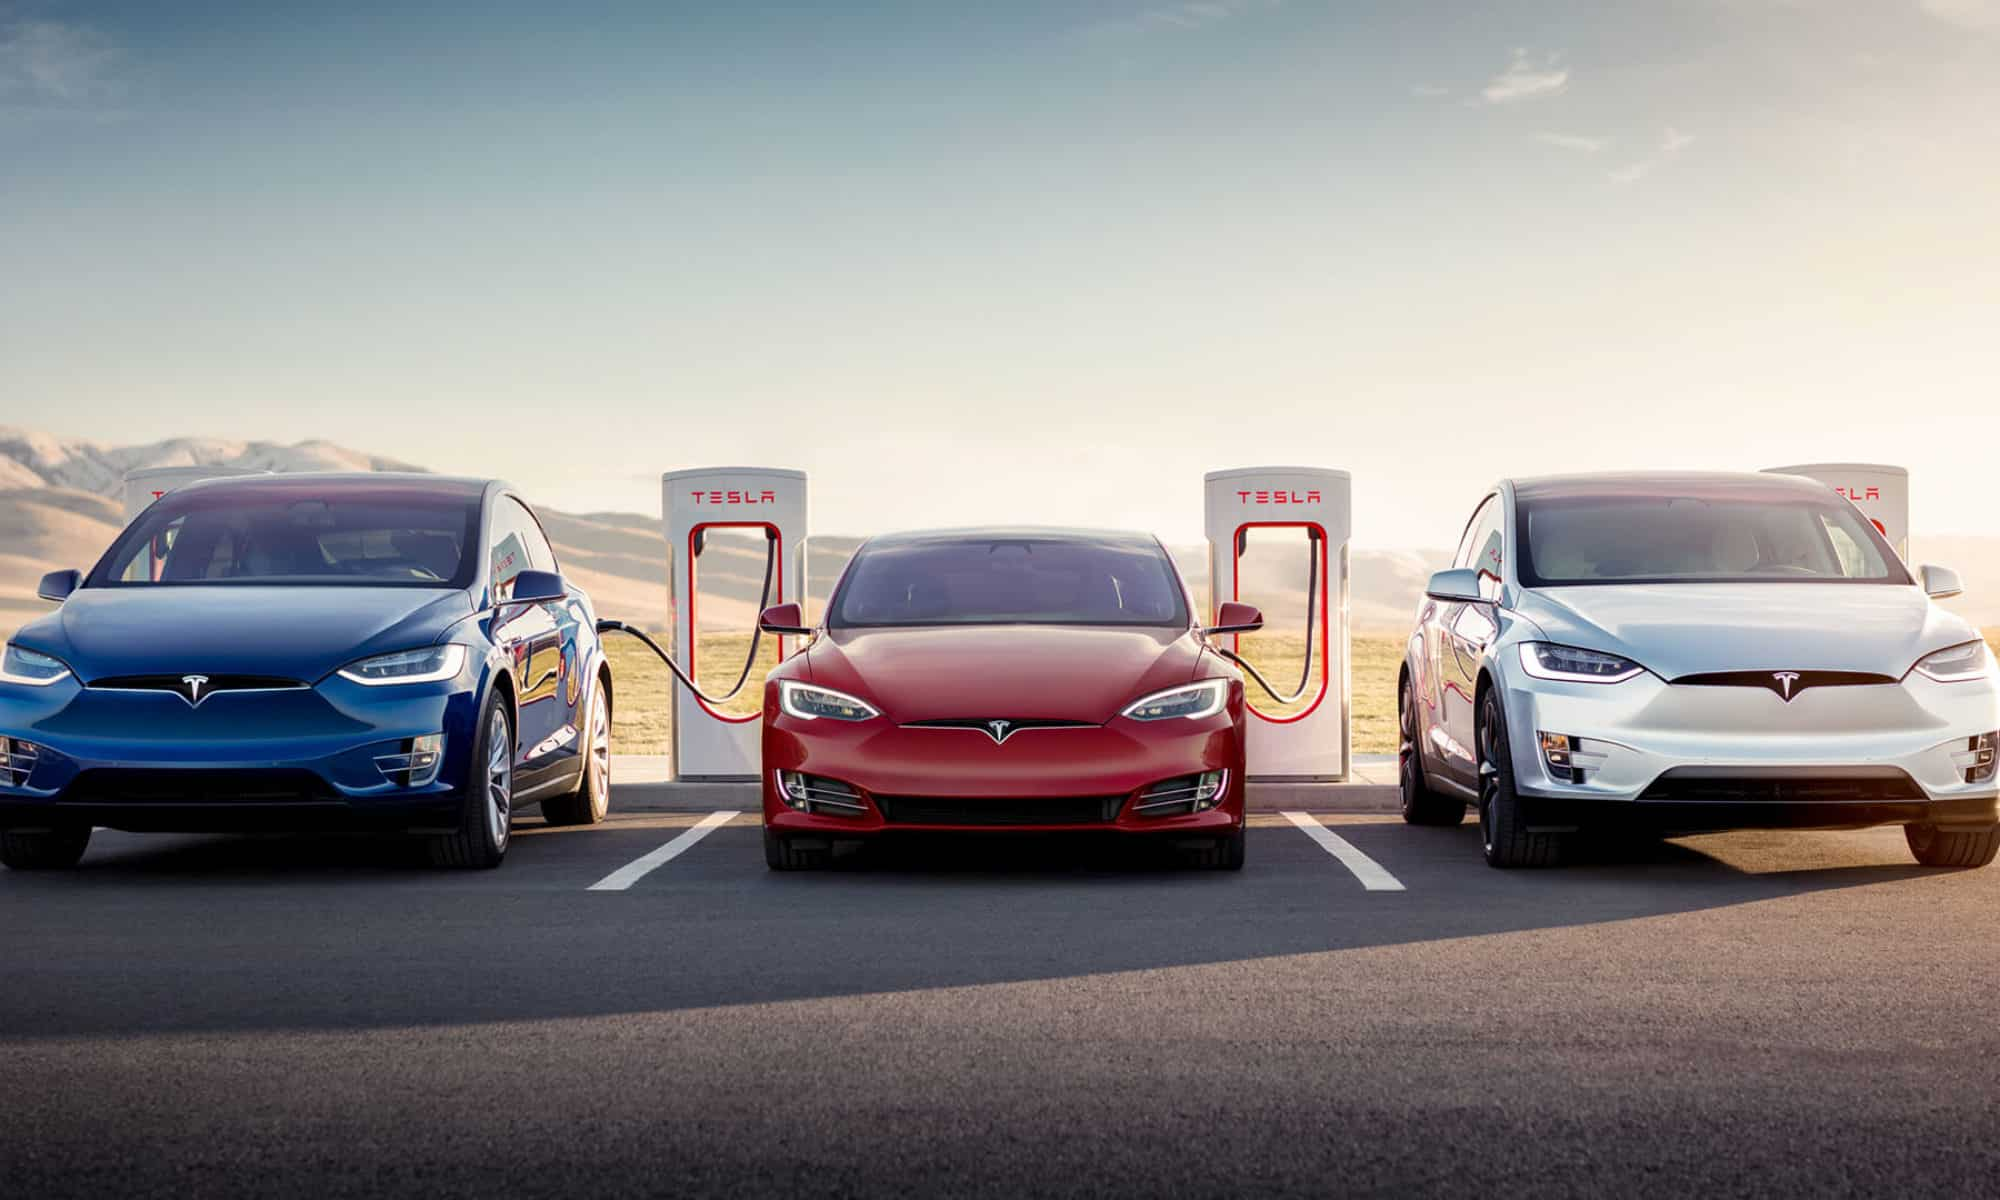 [Tesla] Supercharger